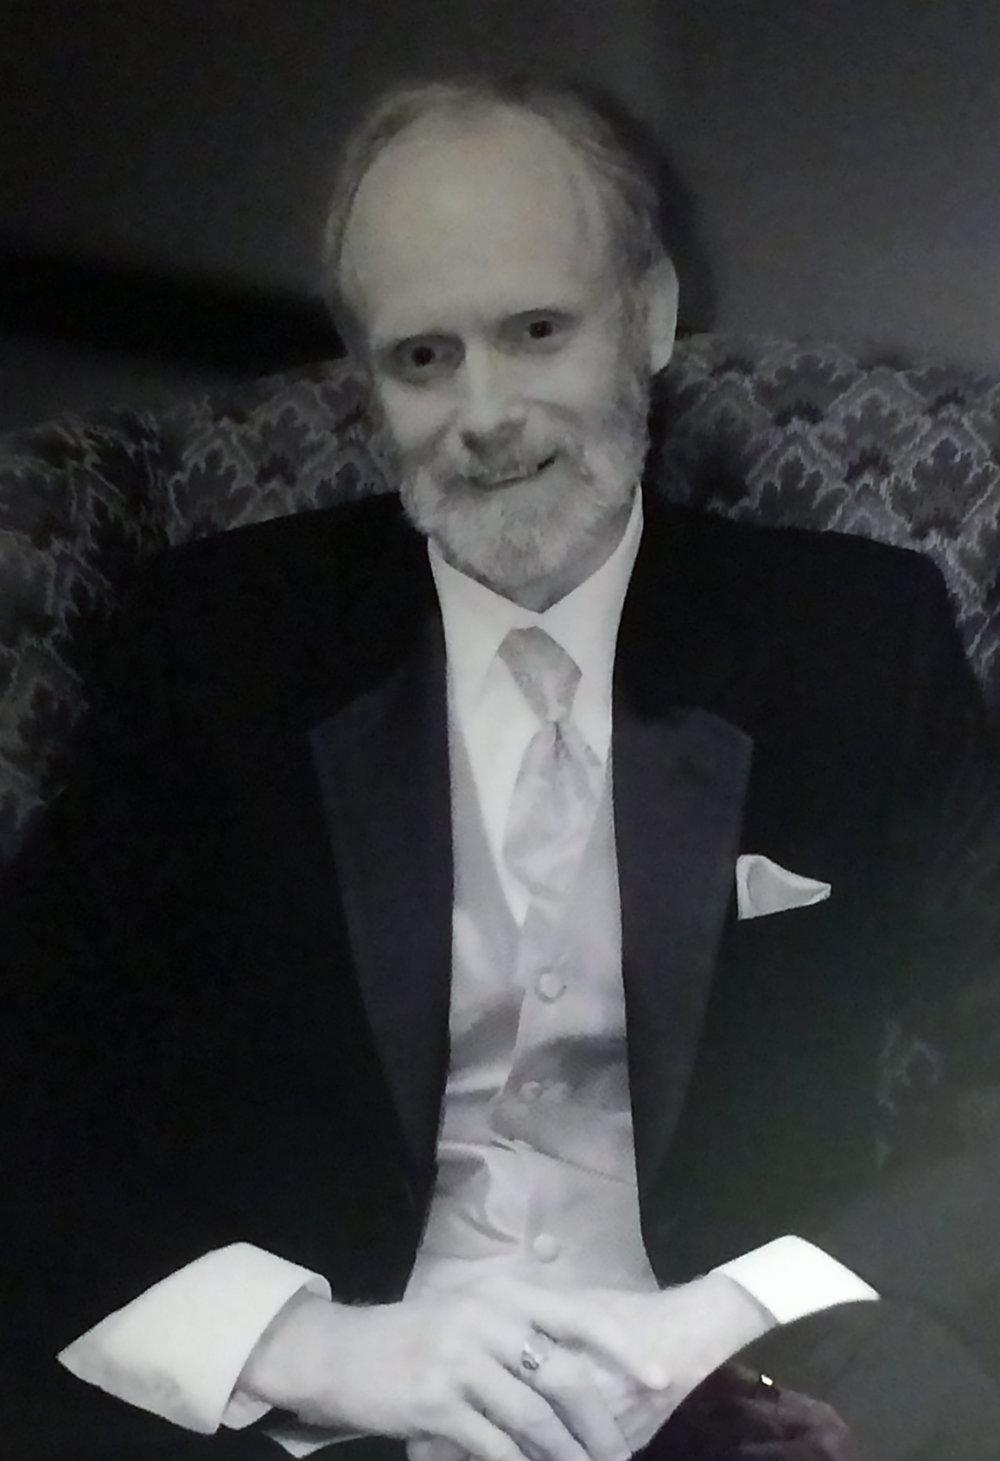 Daniel Dahlquist